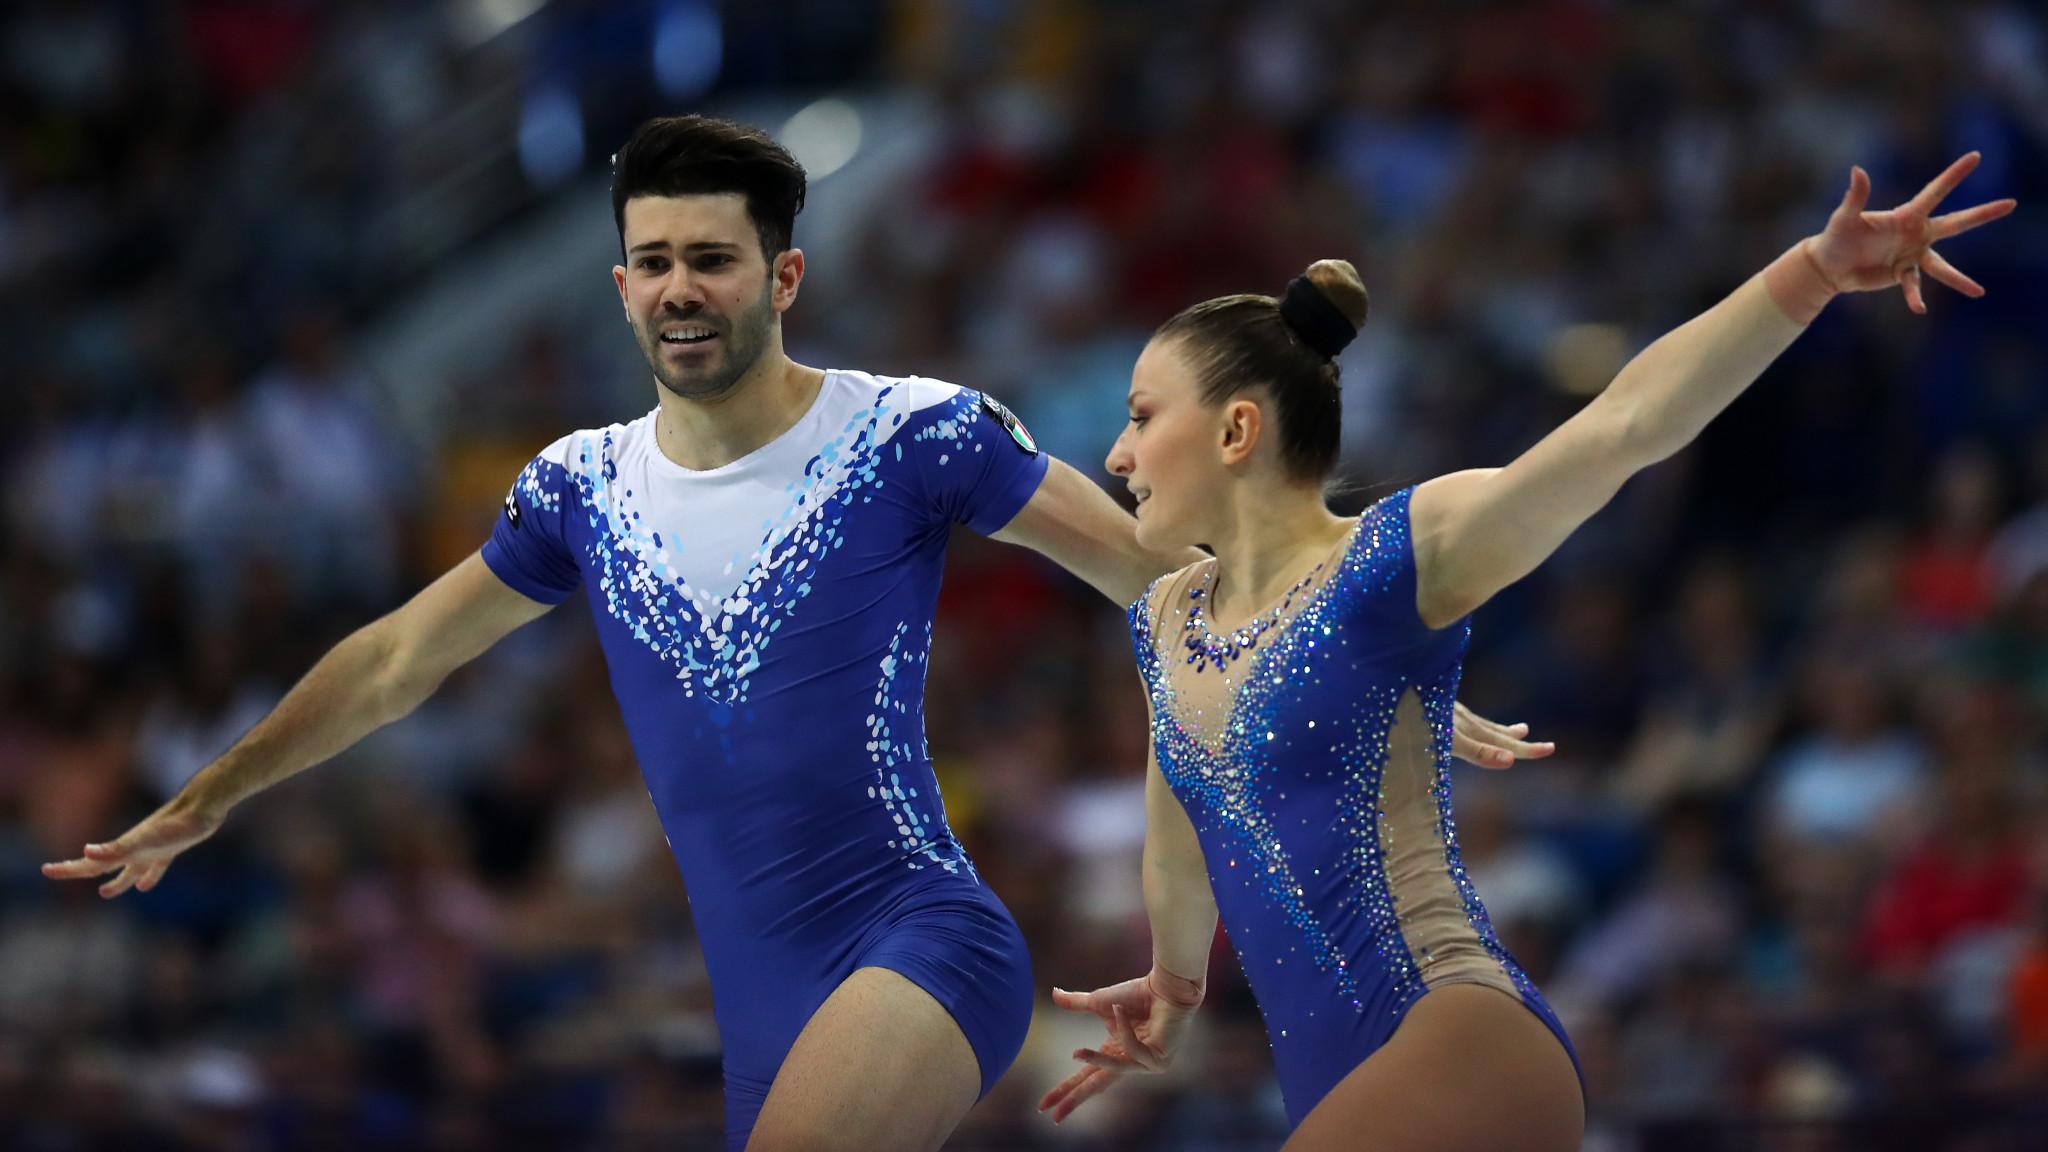 Azerbaijan set to host Aerobic Gymnastics World Championships